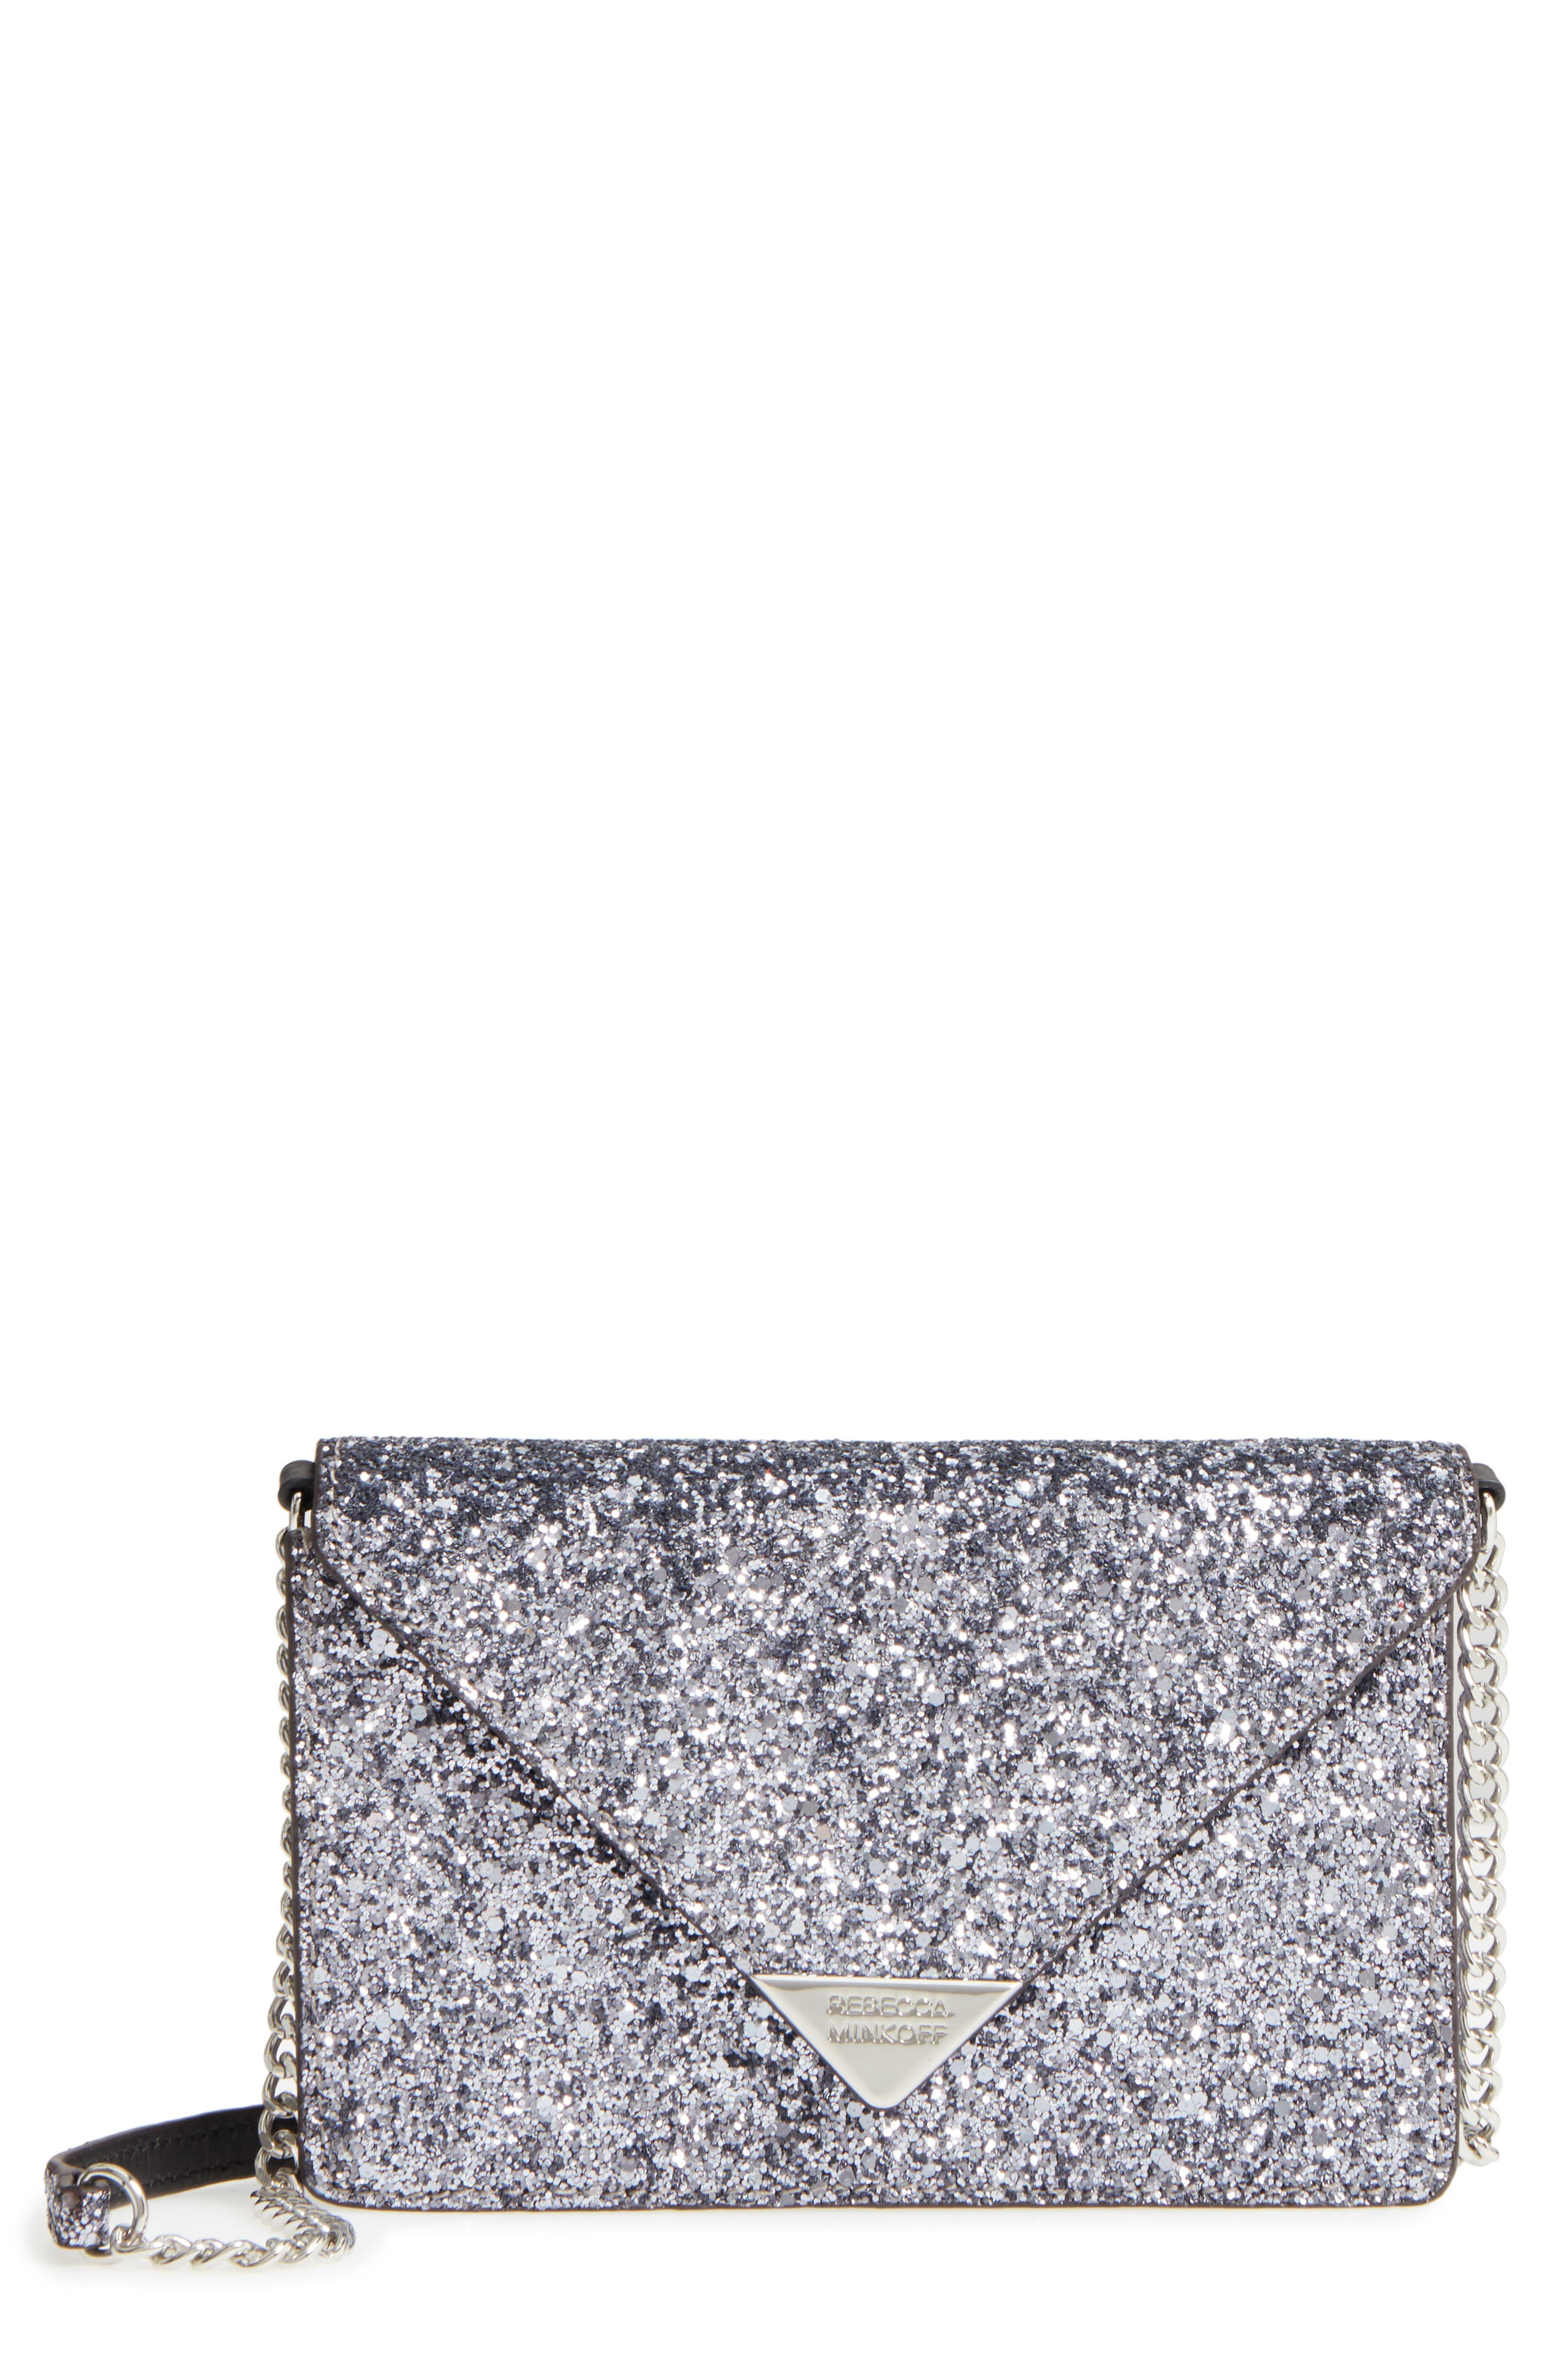 Molly Crossbody Bag,                         Main,                         color, 040